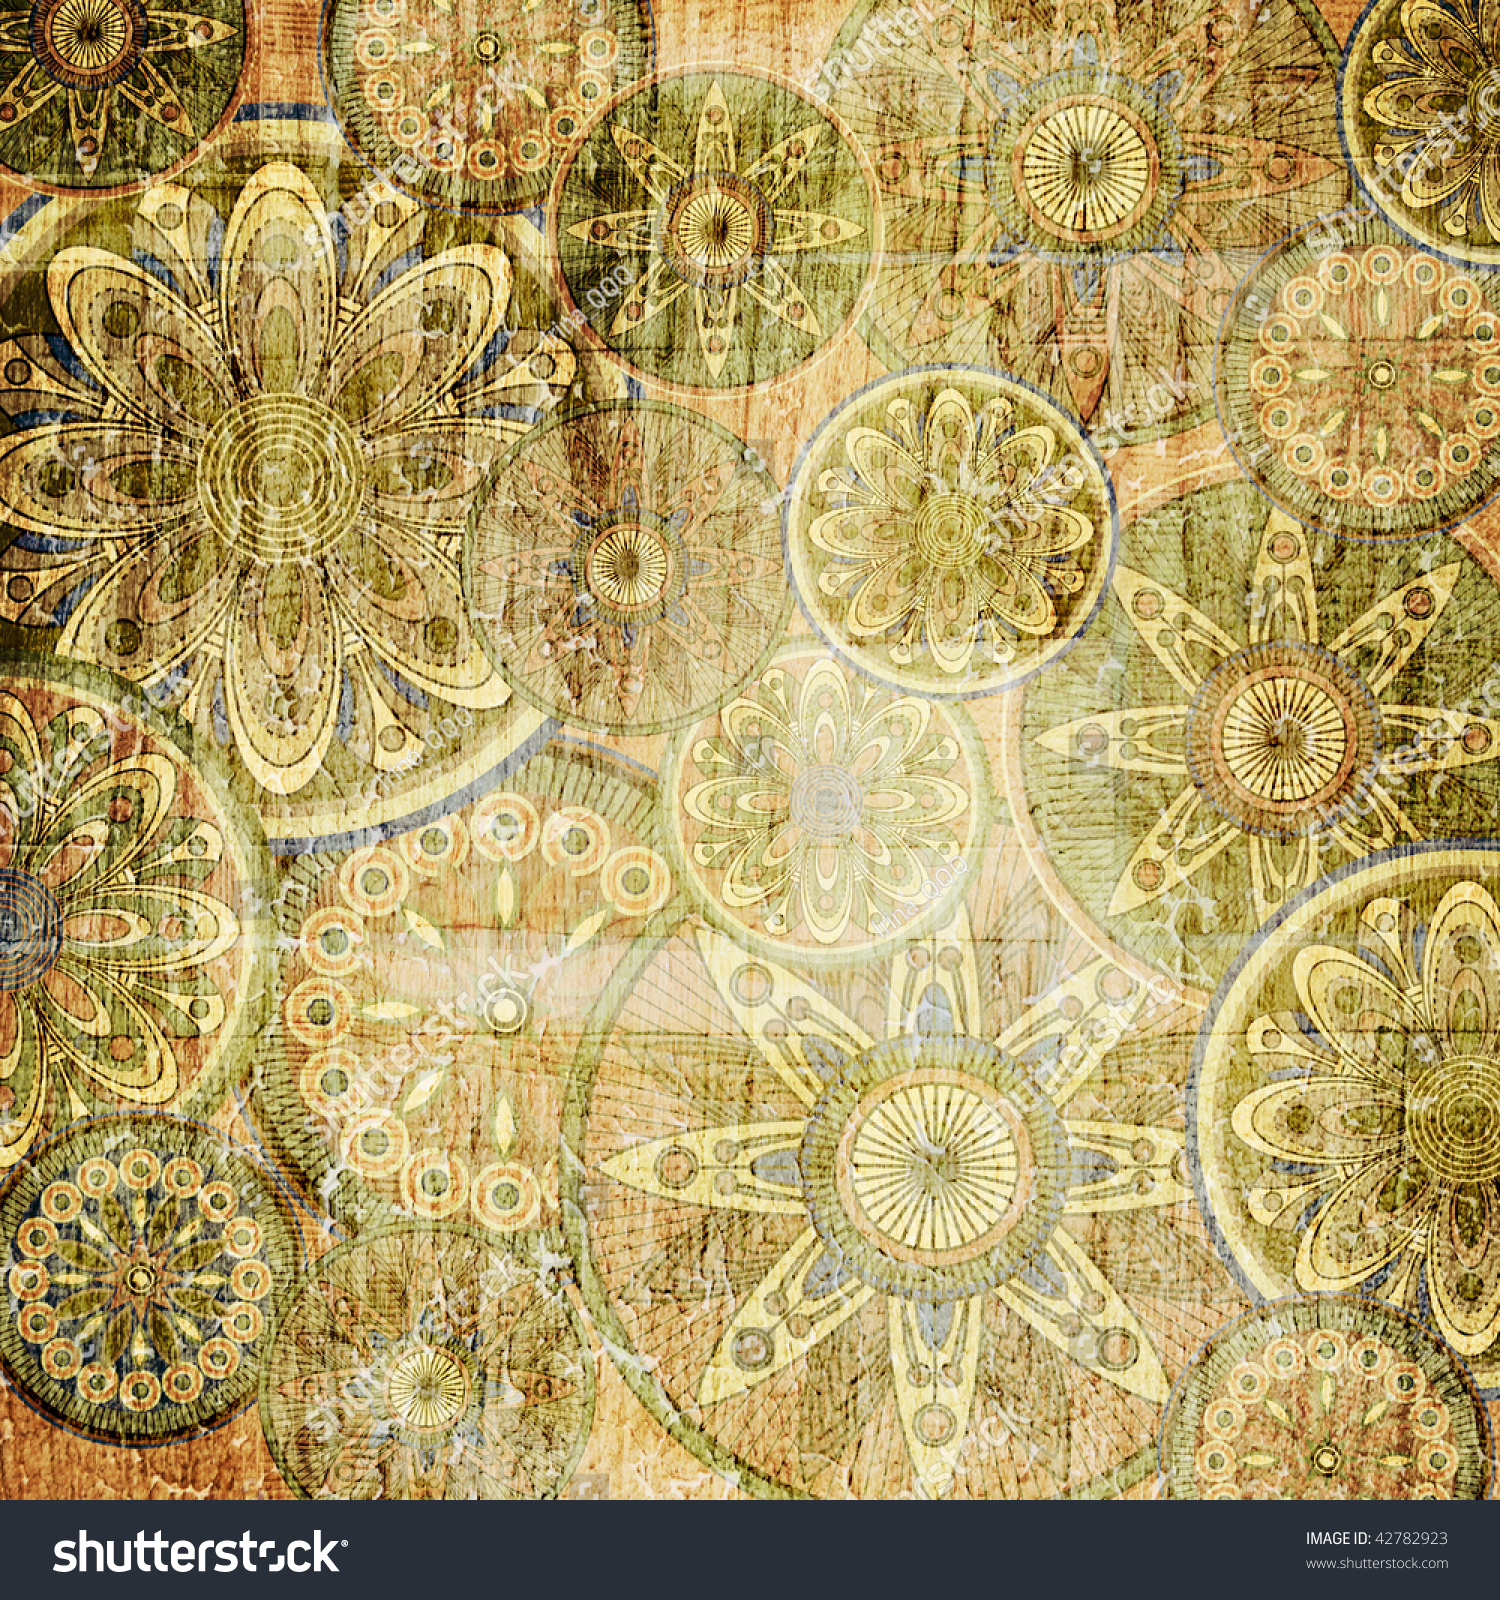 art vintage stylization floral background in sepia | EZ Canvas